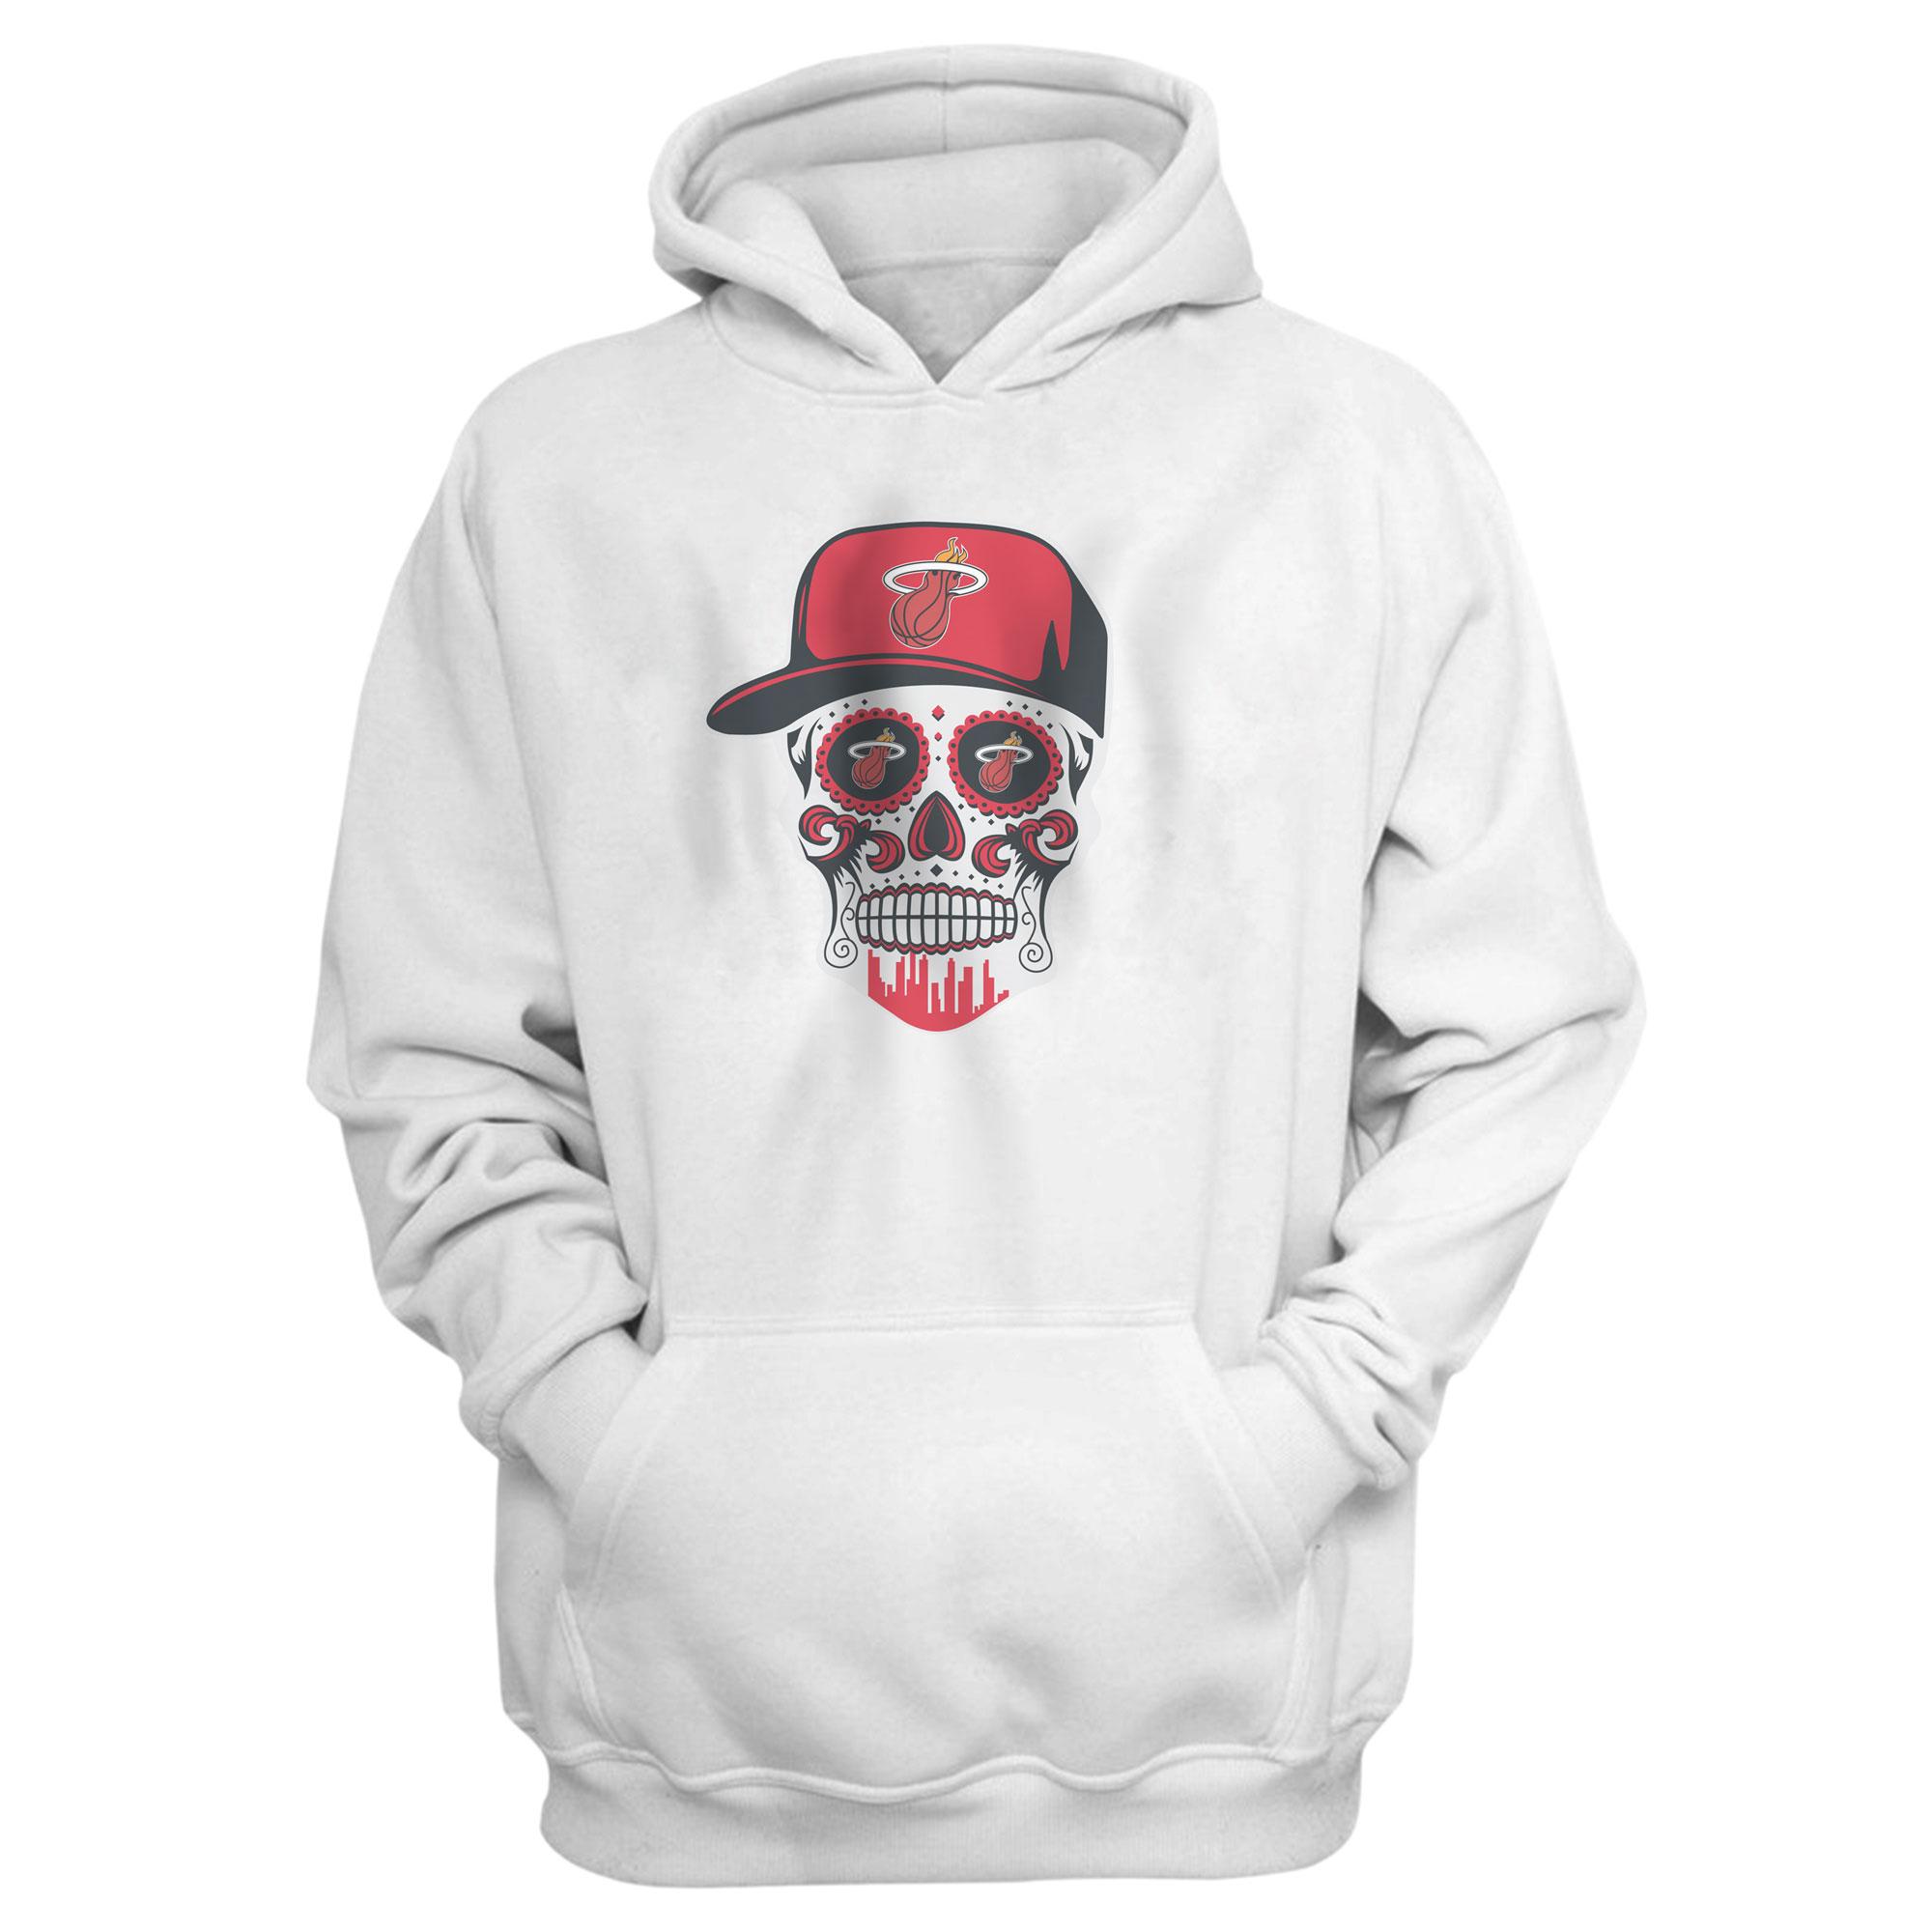 Heat Skull Hoodie  (HD-WHT-NP-456-NBA-MIAMI-SKULL)